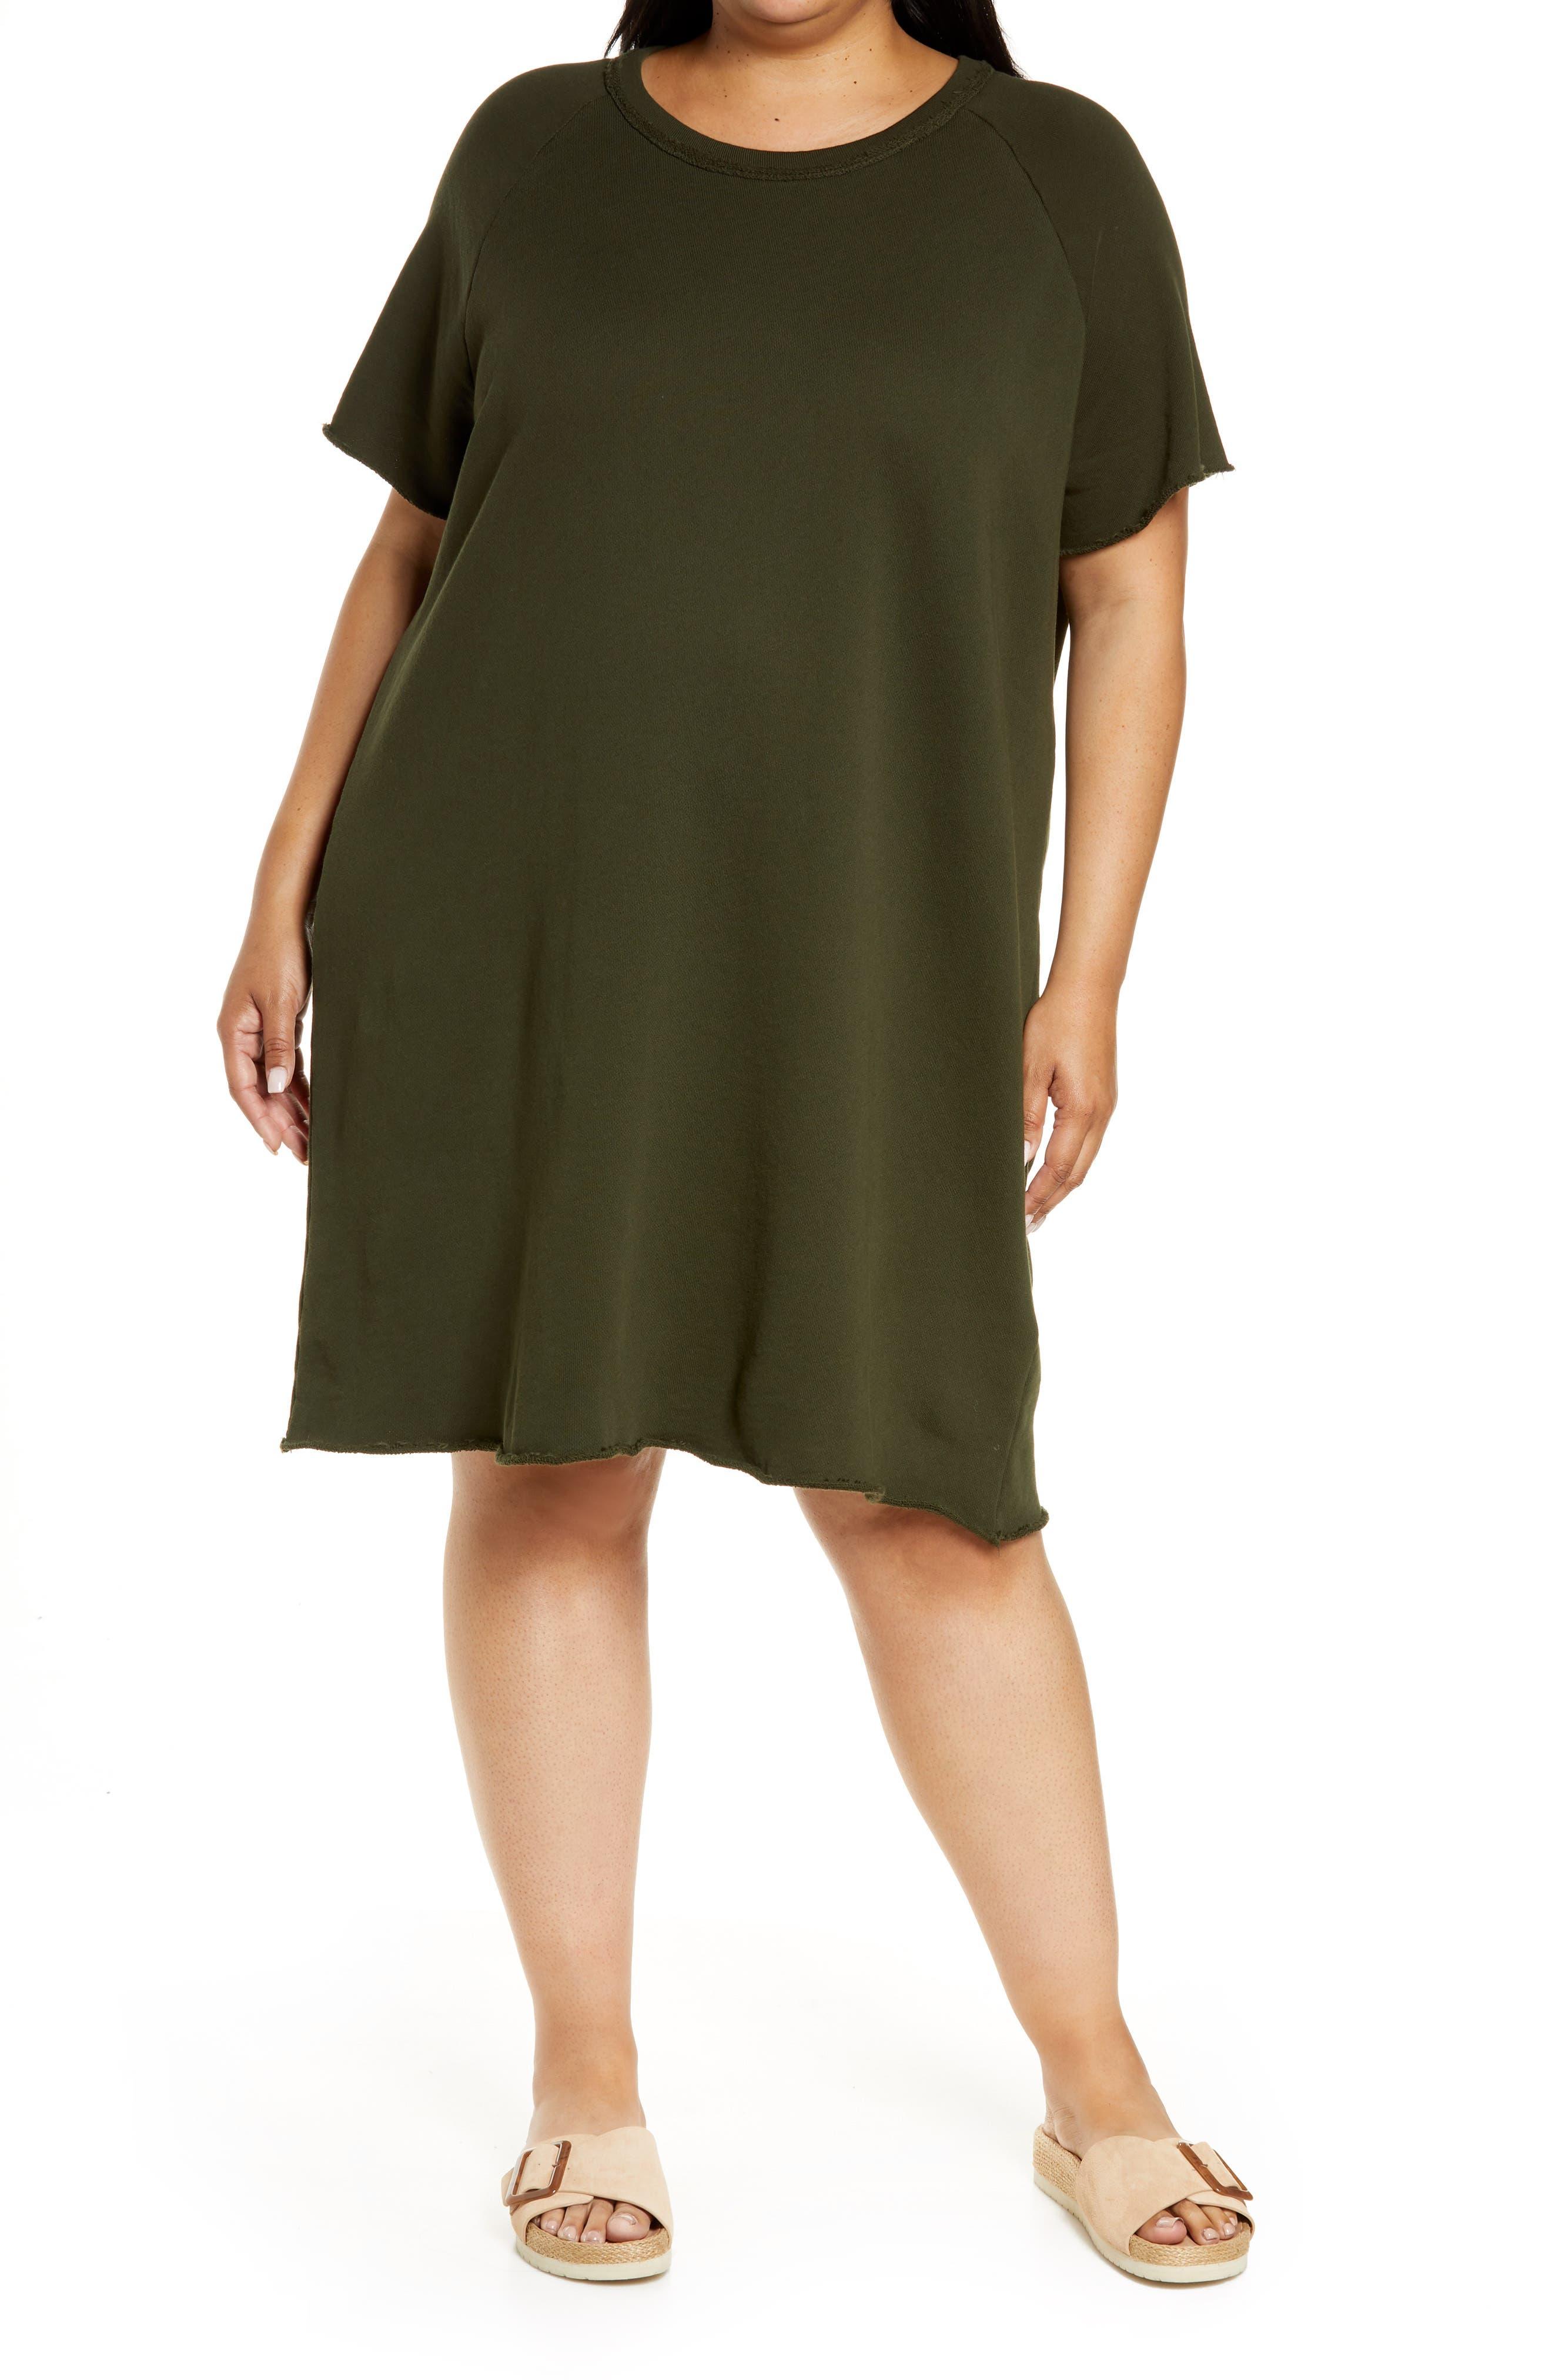 Eileen Fisher Blue Violet Sleeveless Organic Cotton Hemp Cotton Dress XS